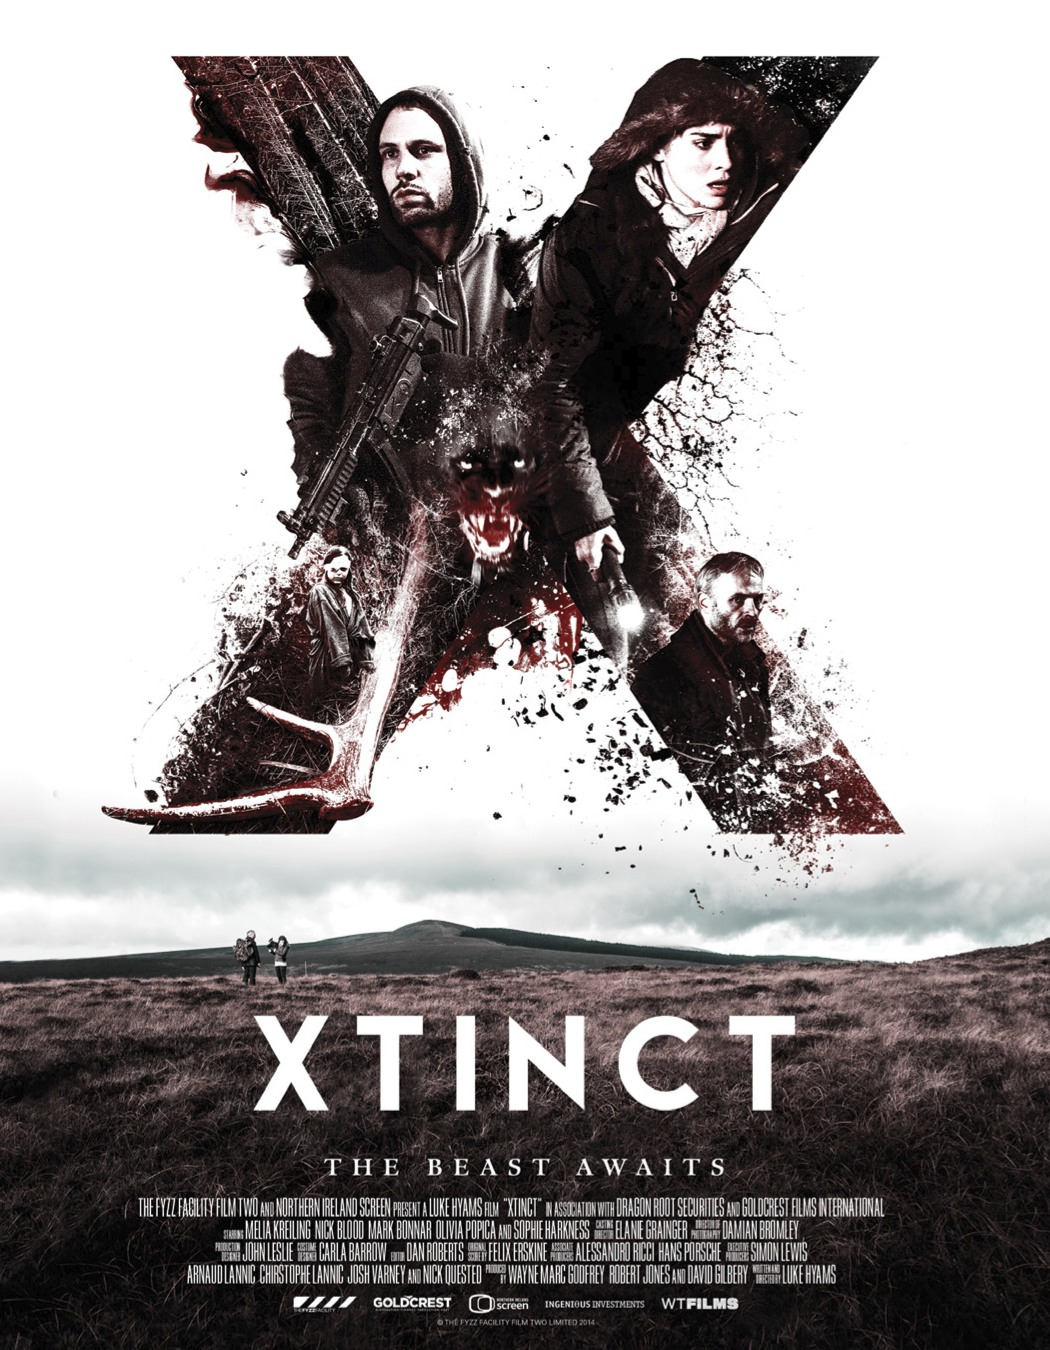 XTINCT